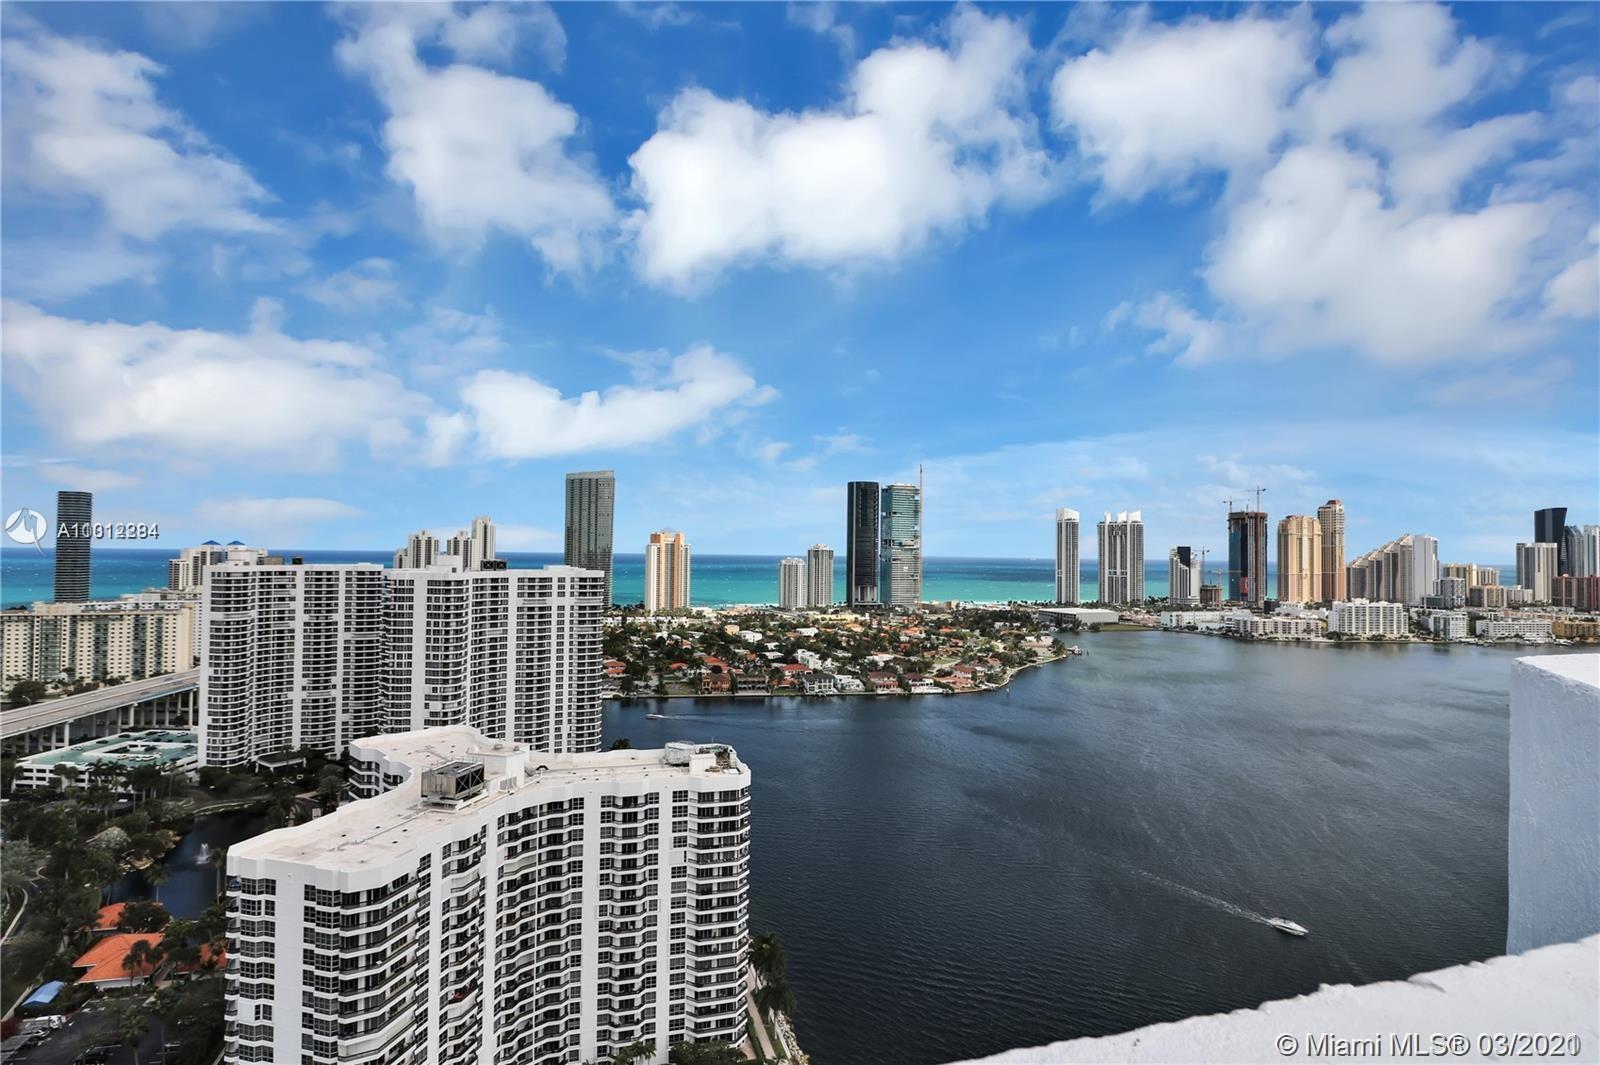 Mystic Pointe Tower 500 #PH14 - 3530 Mystic Pointe Dr #PH14, Aventura, FL 33180